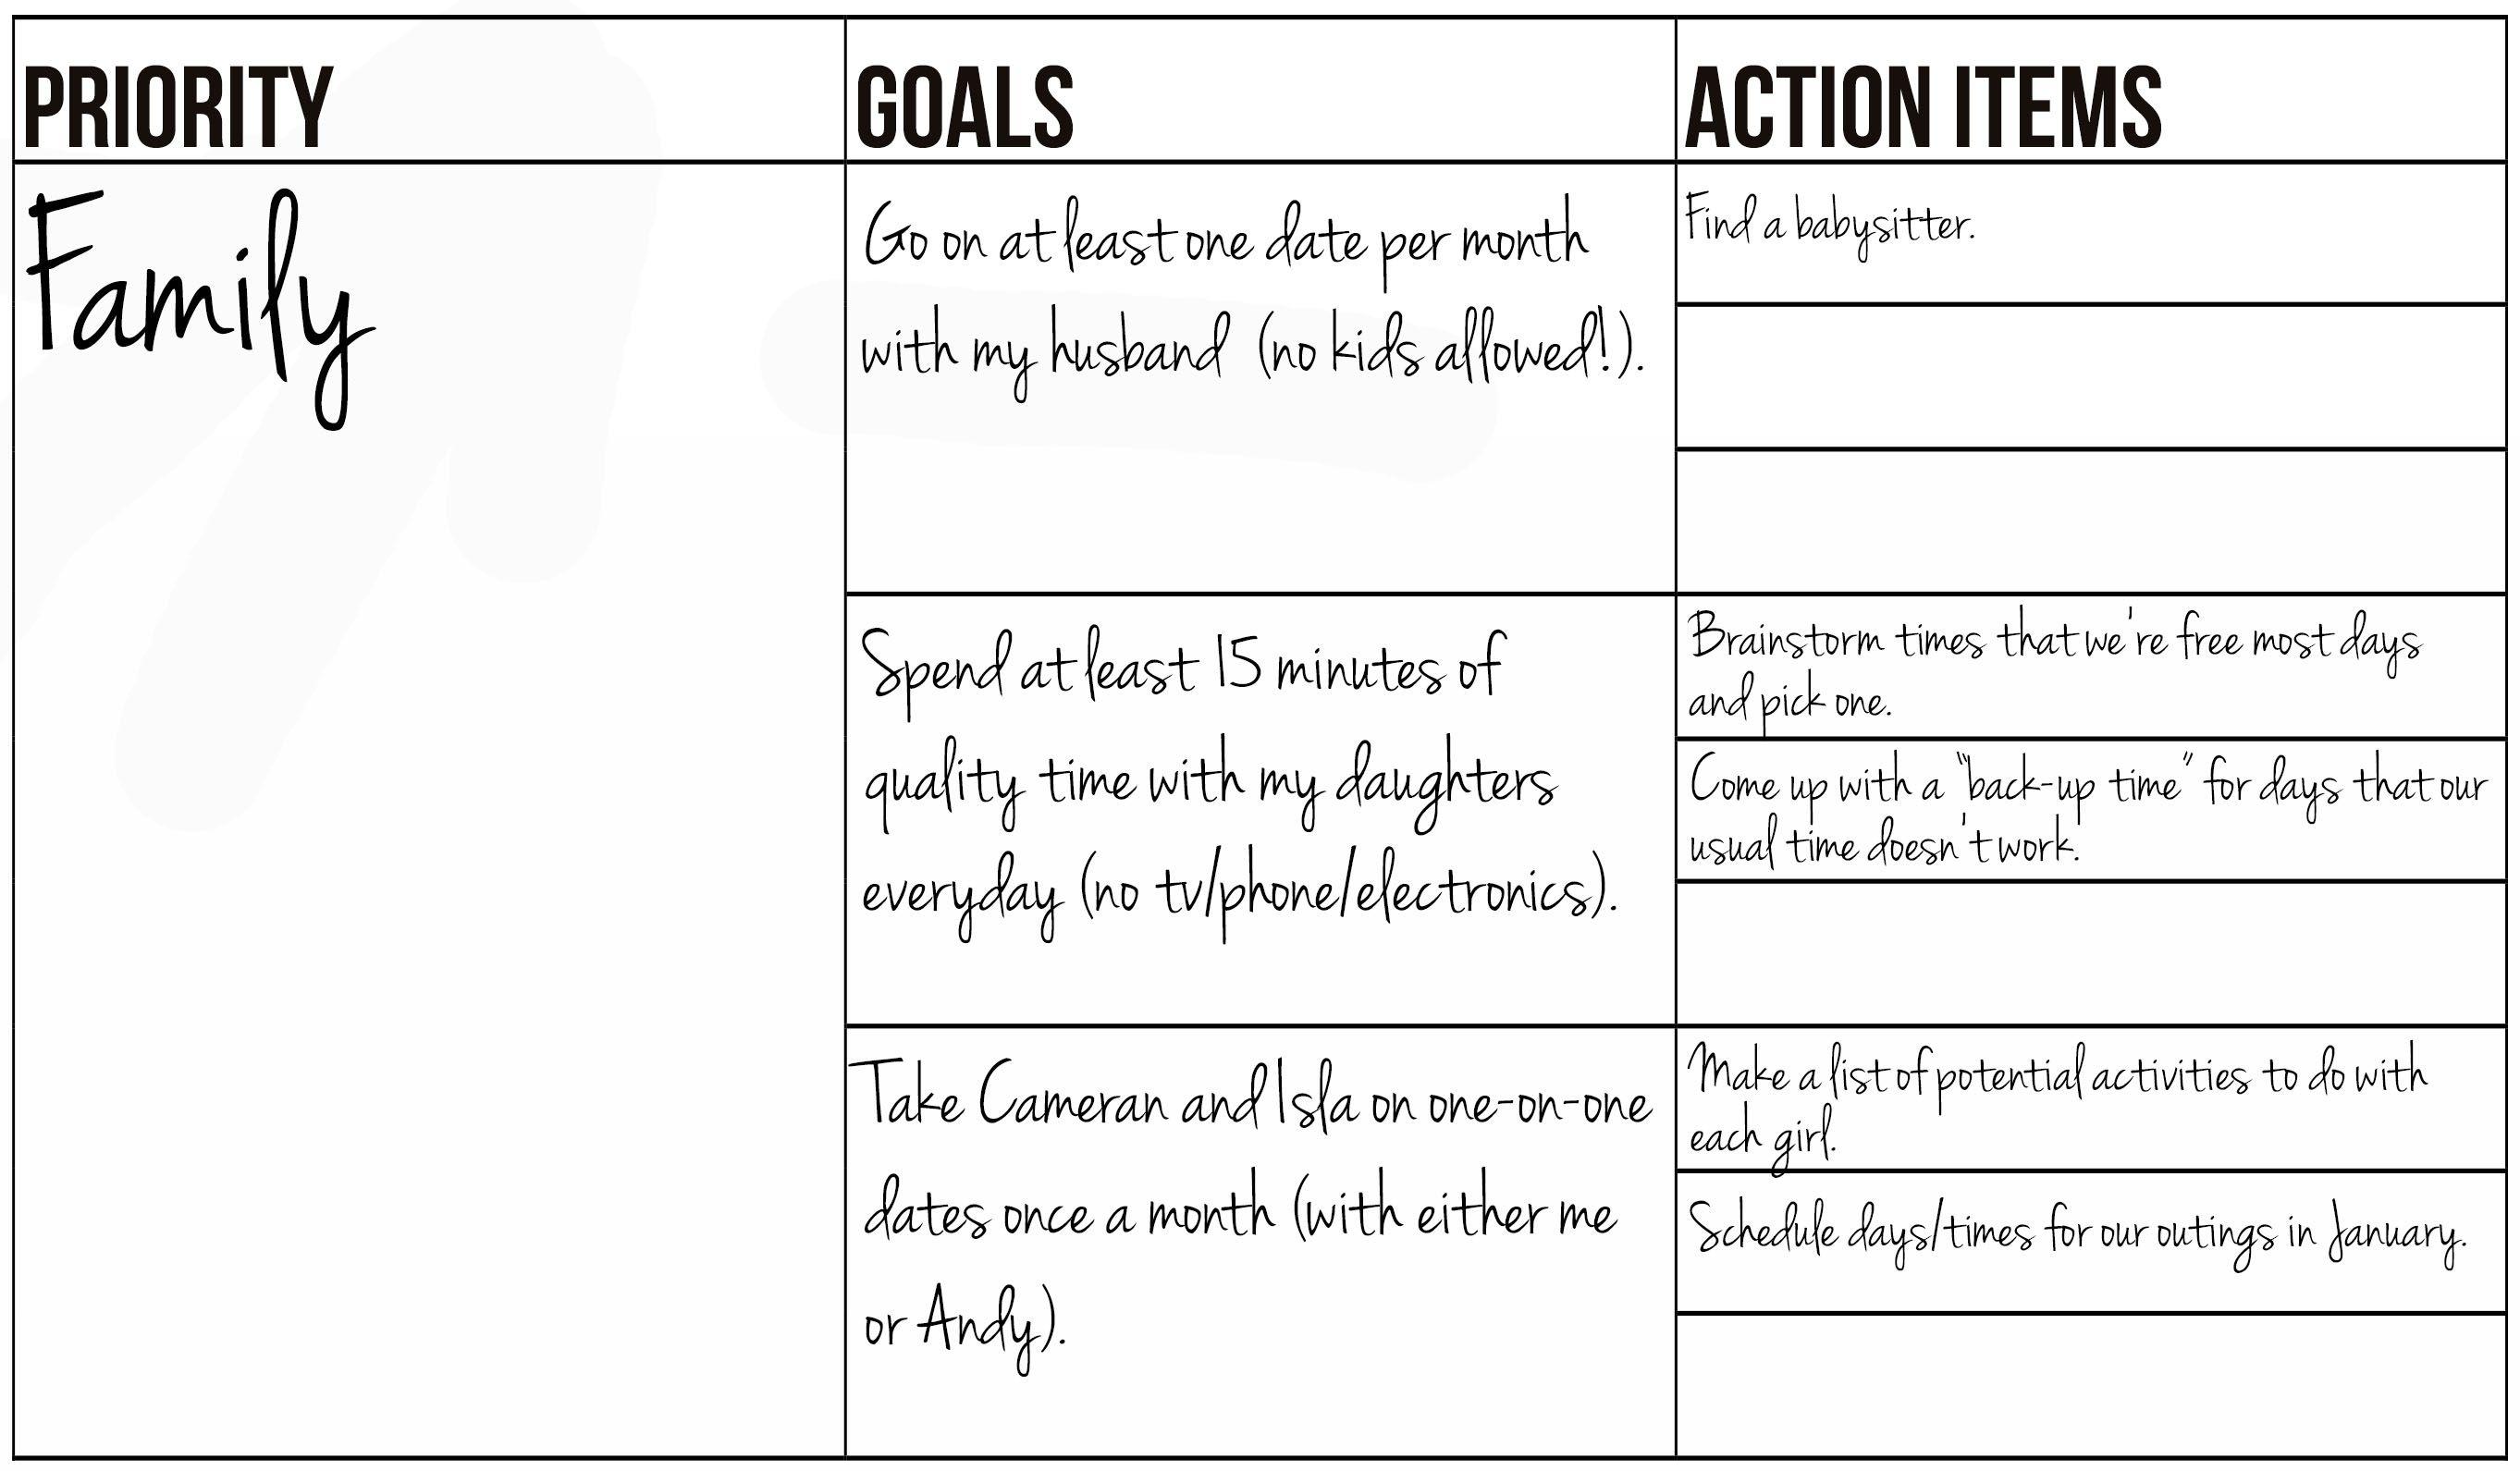 free printable goal setting worksheet and instructions printables pinterest goal setting. Black Bedroom Furniture Sets. Home Design Ideas